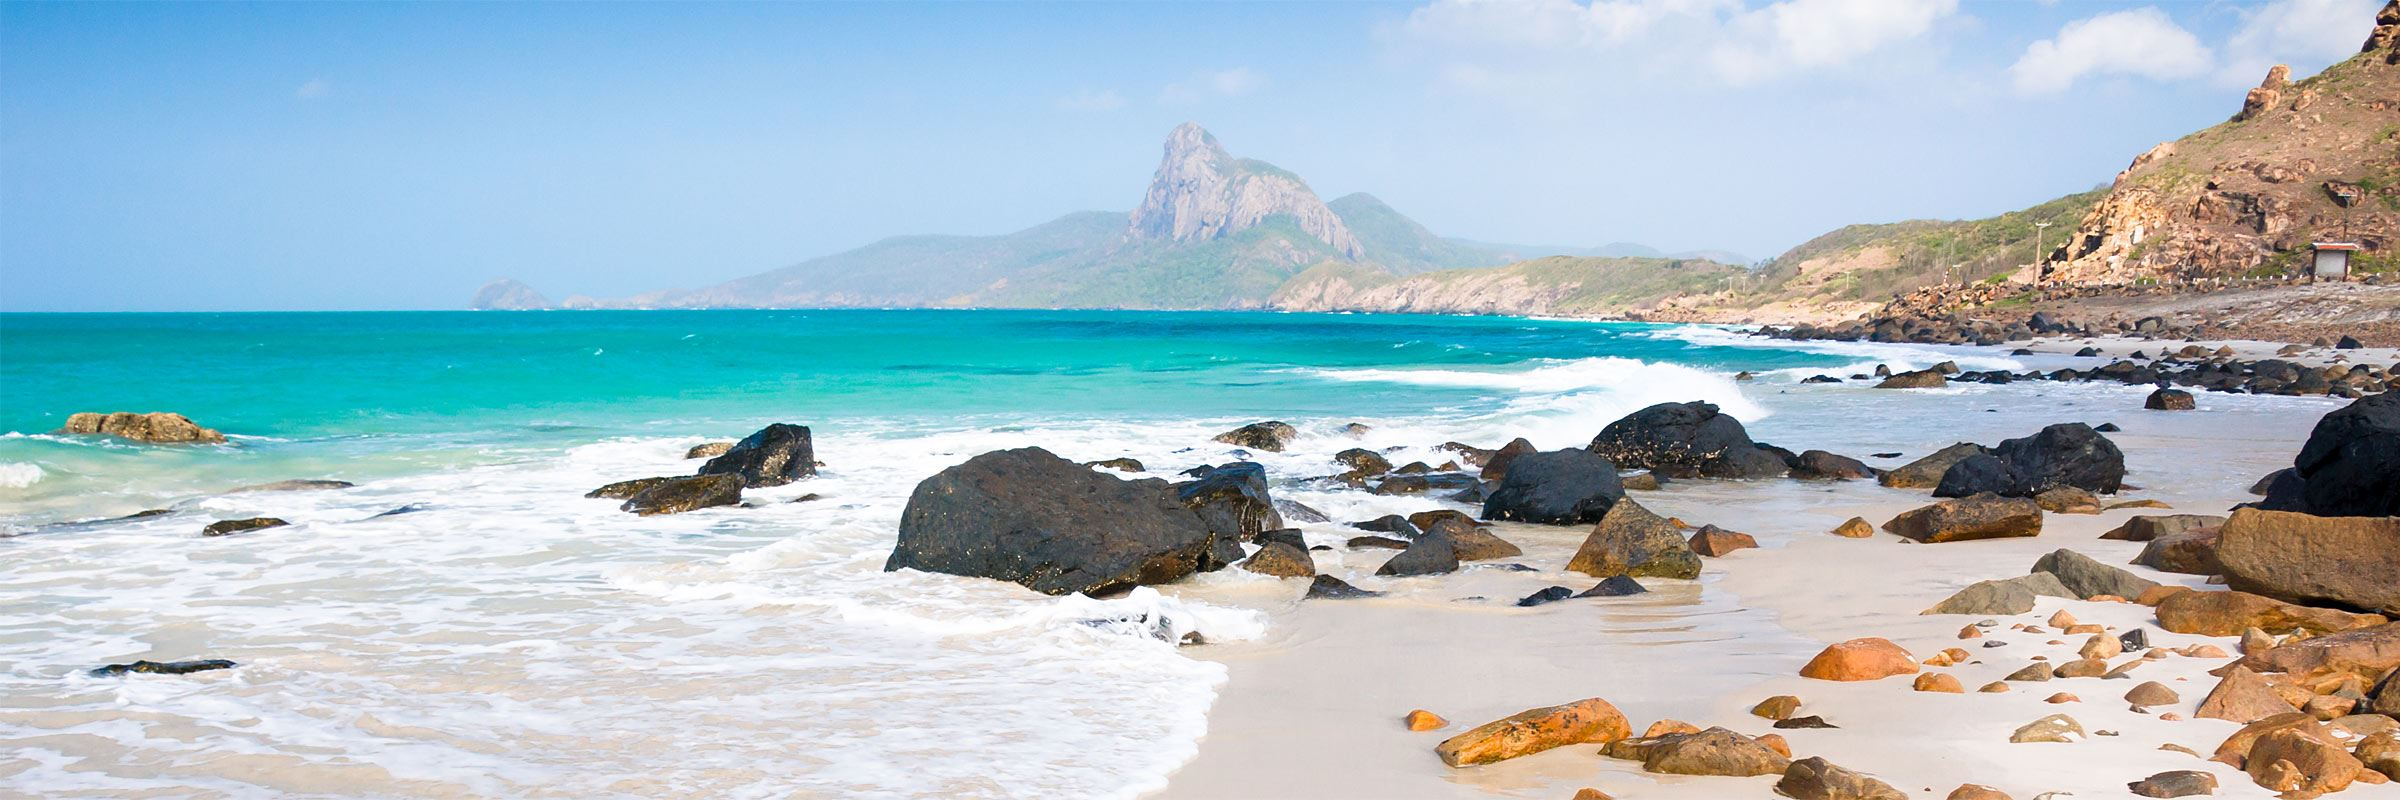 visit con dao islands on a trip to vietnam audley travel rh audleytravel com